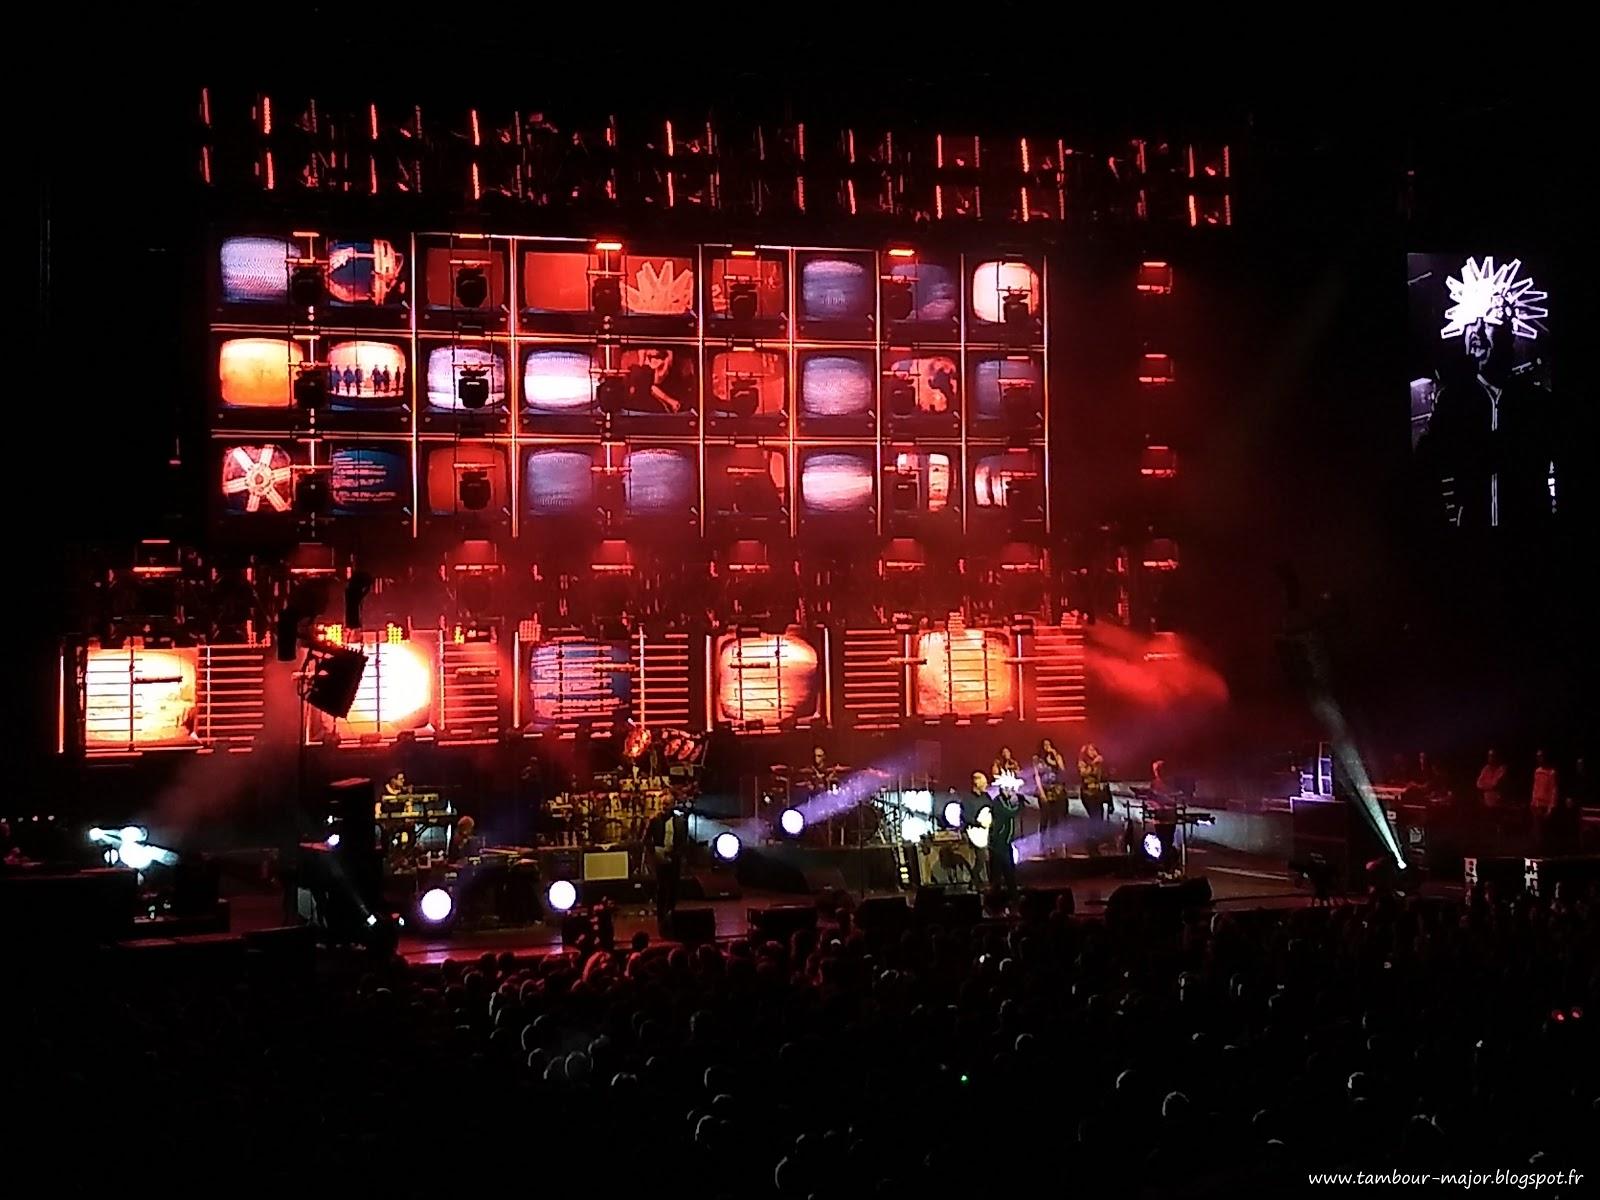 Clignotant Nichons Concerts